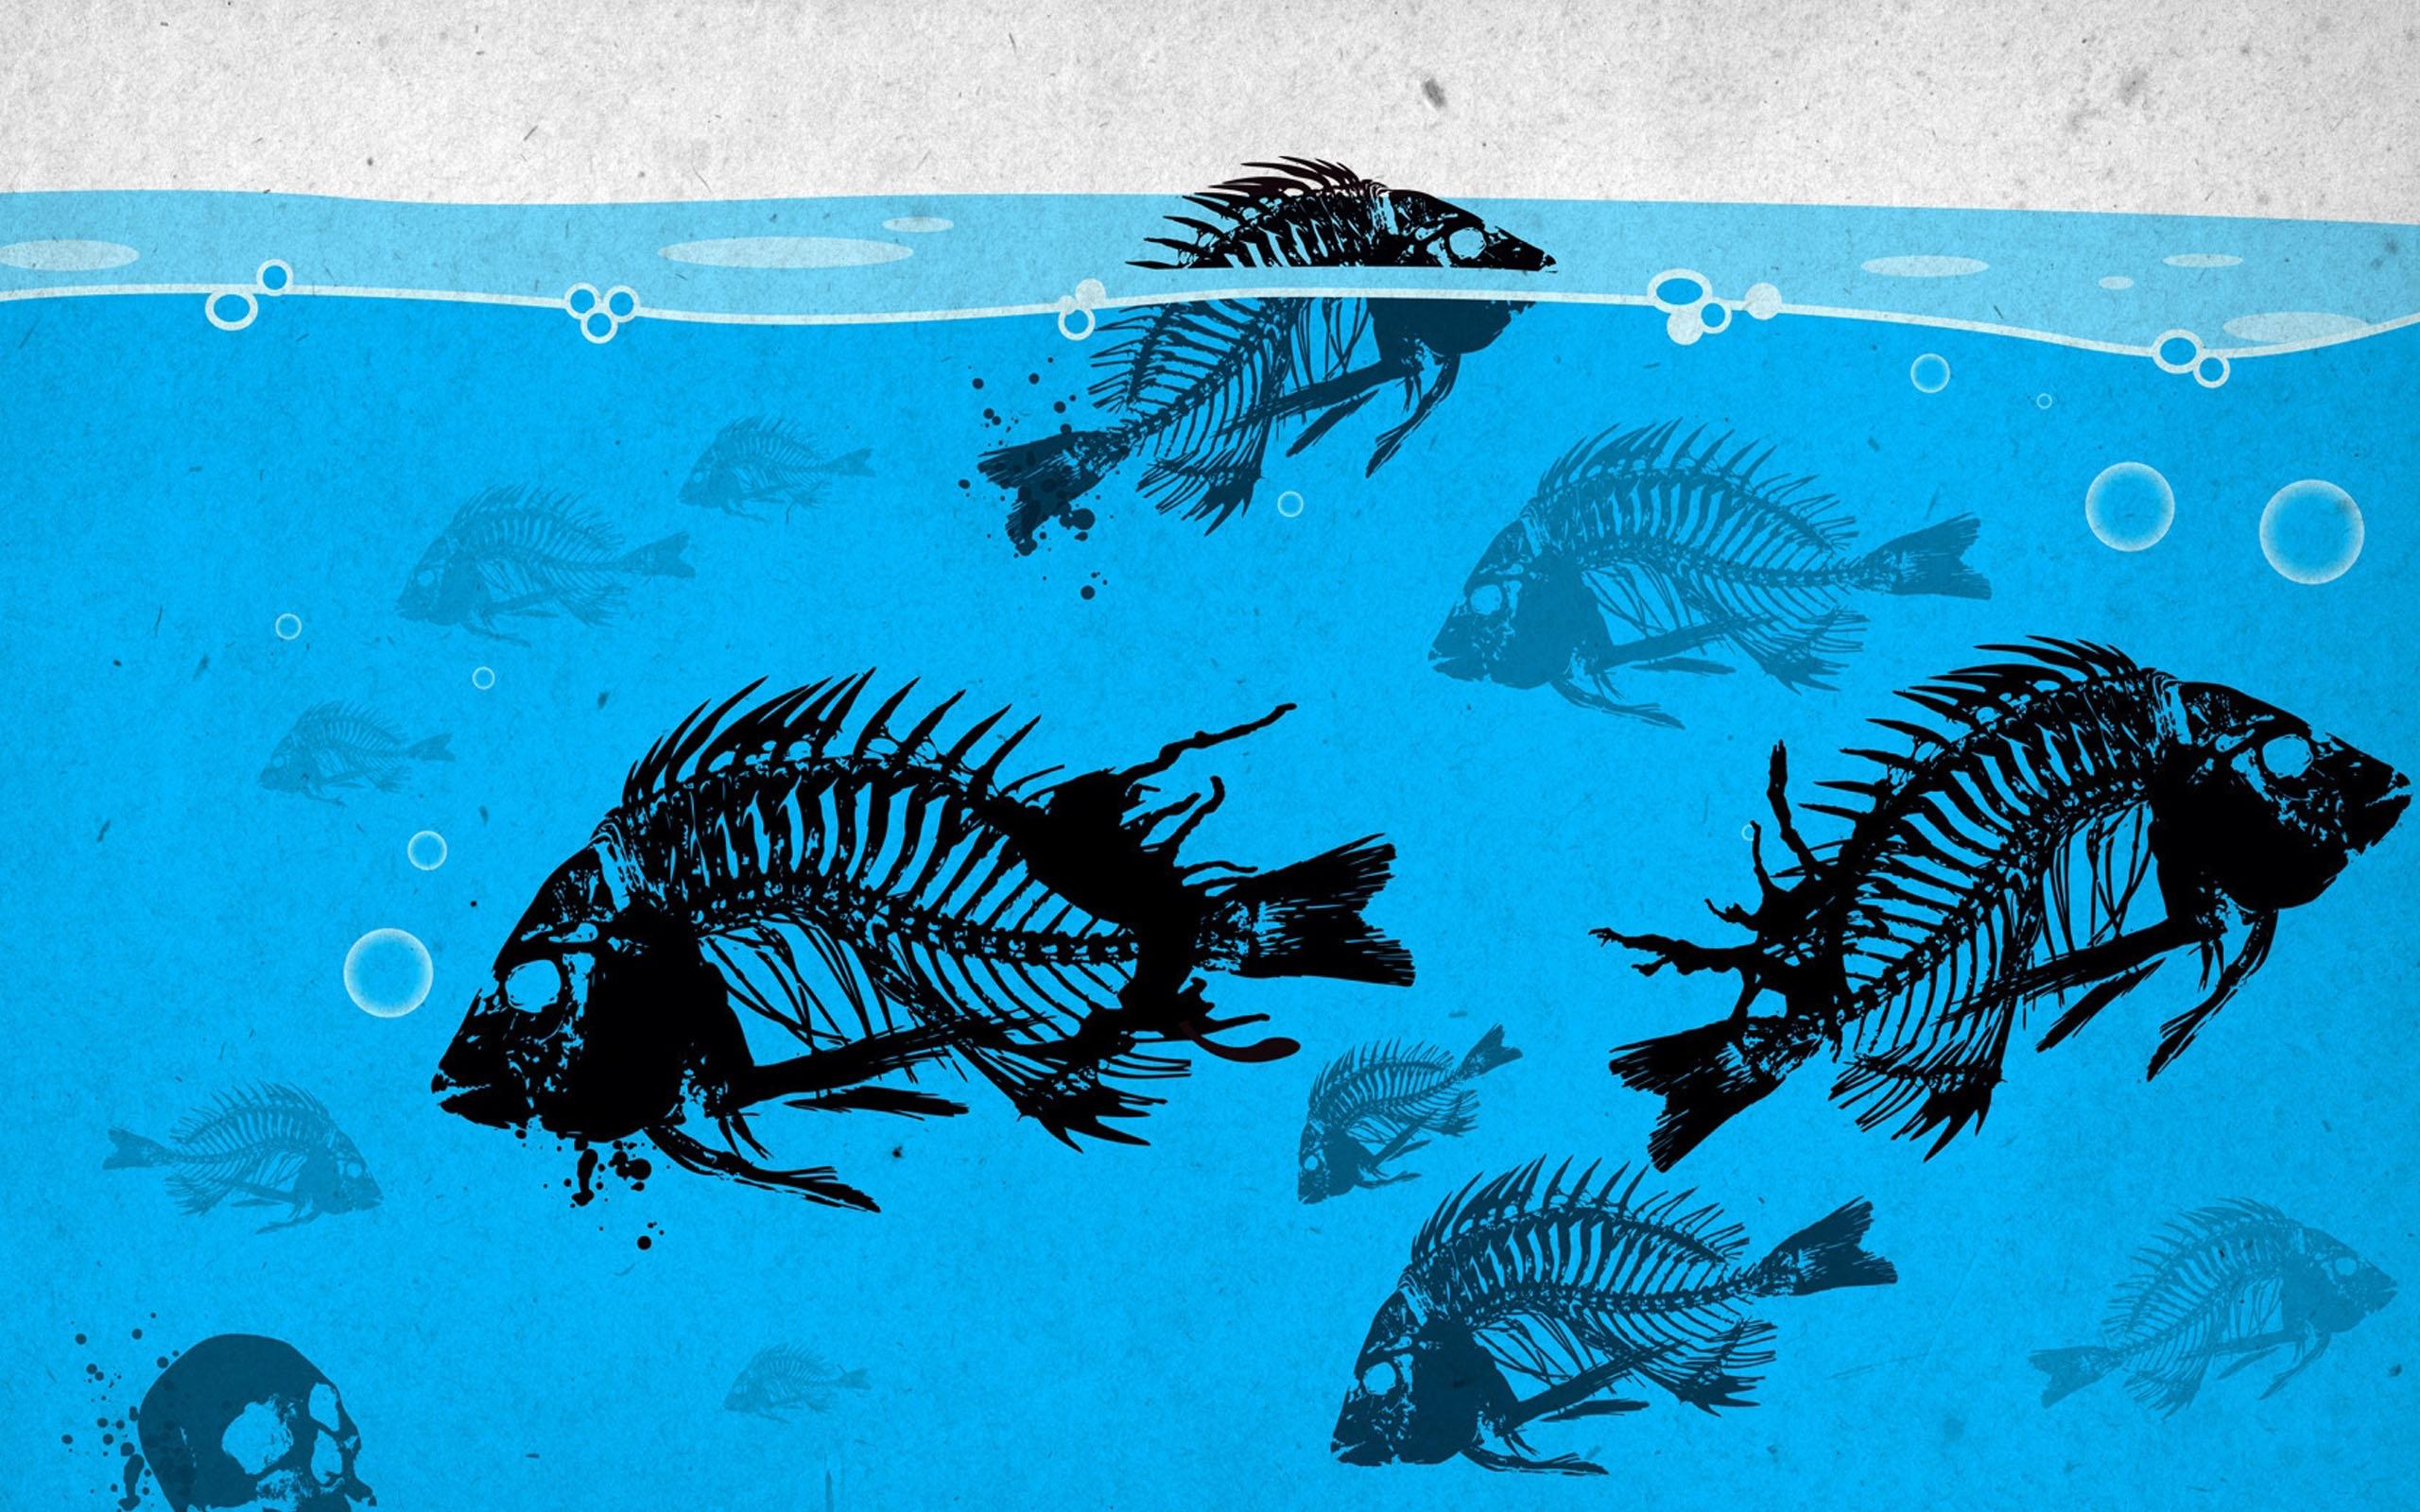 Bass Fishing Cartoon Wallpaper Newest fishing wallpaper 2560x1600